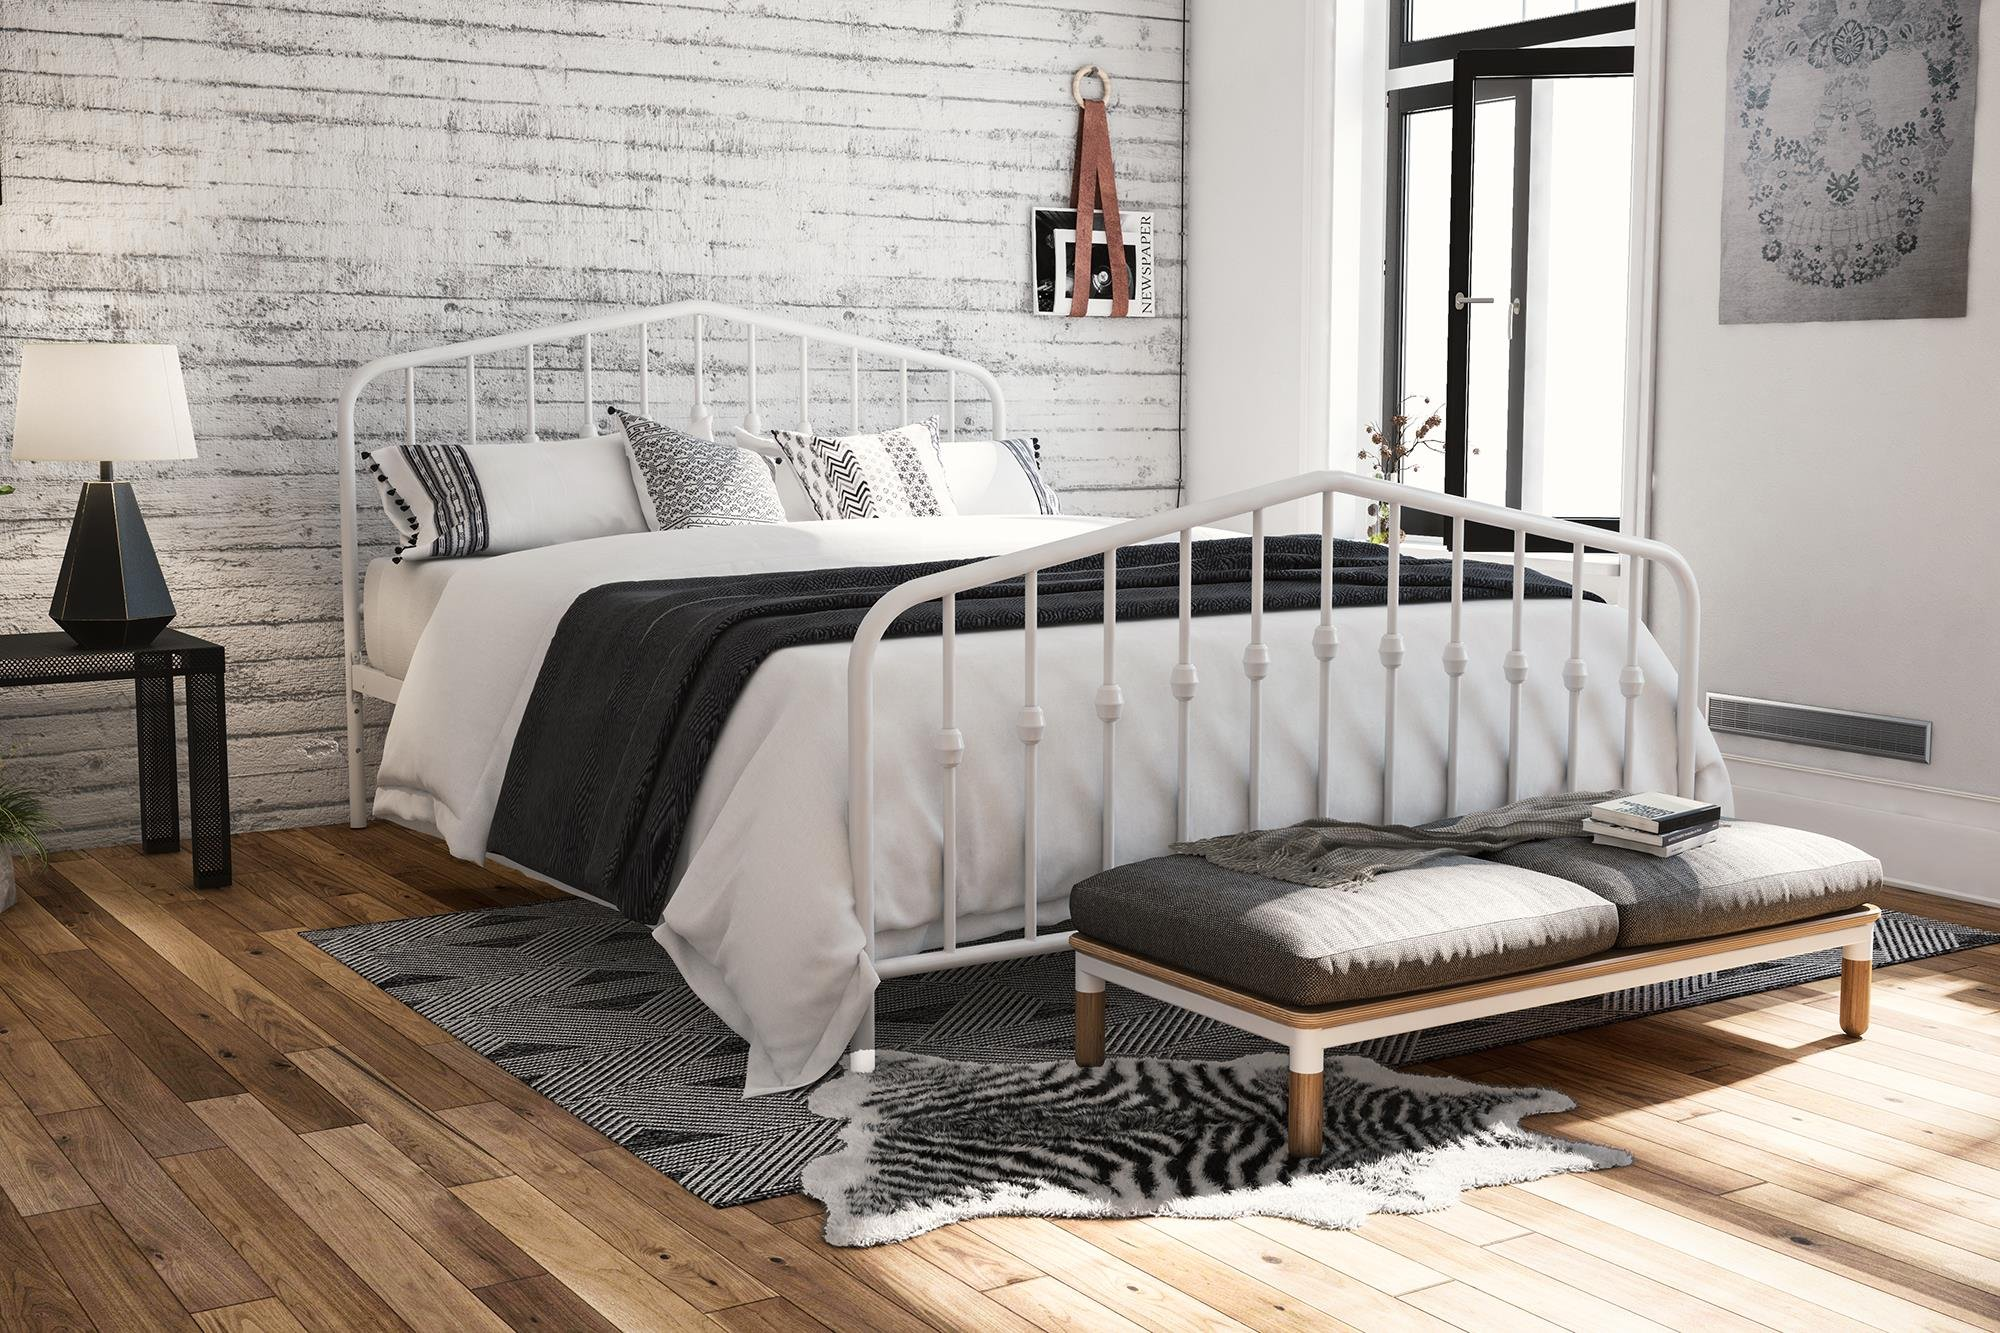 Novogratz Bushwick Metal Bed with Headboard and Footboard | Modern Design | Queen Size - White